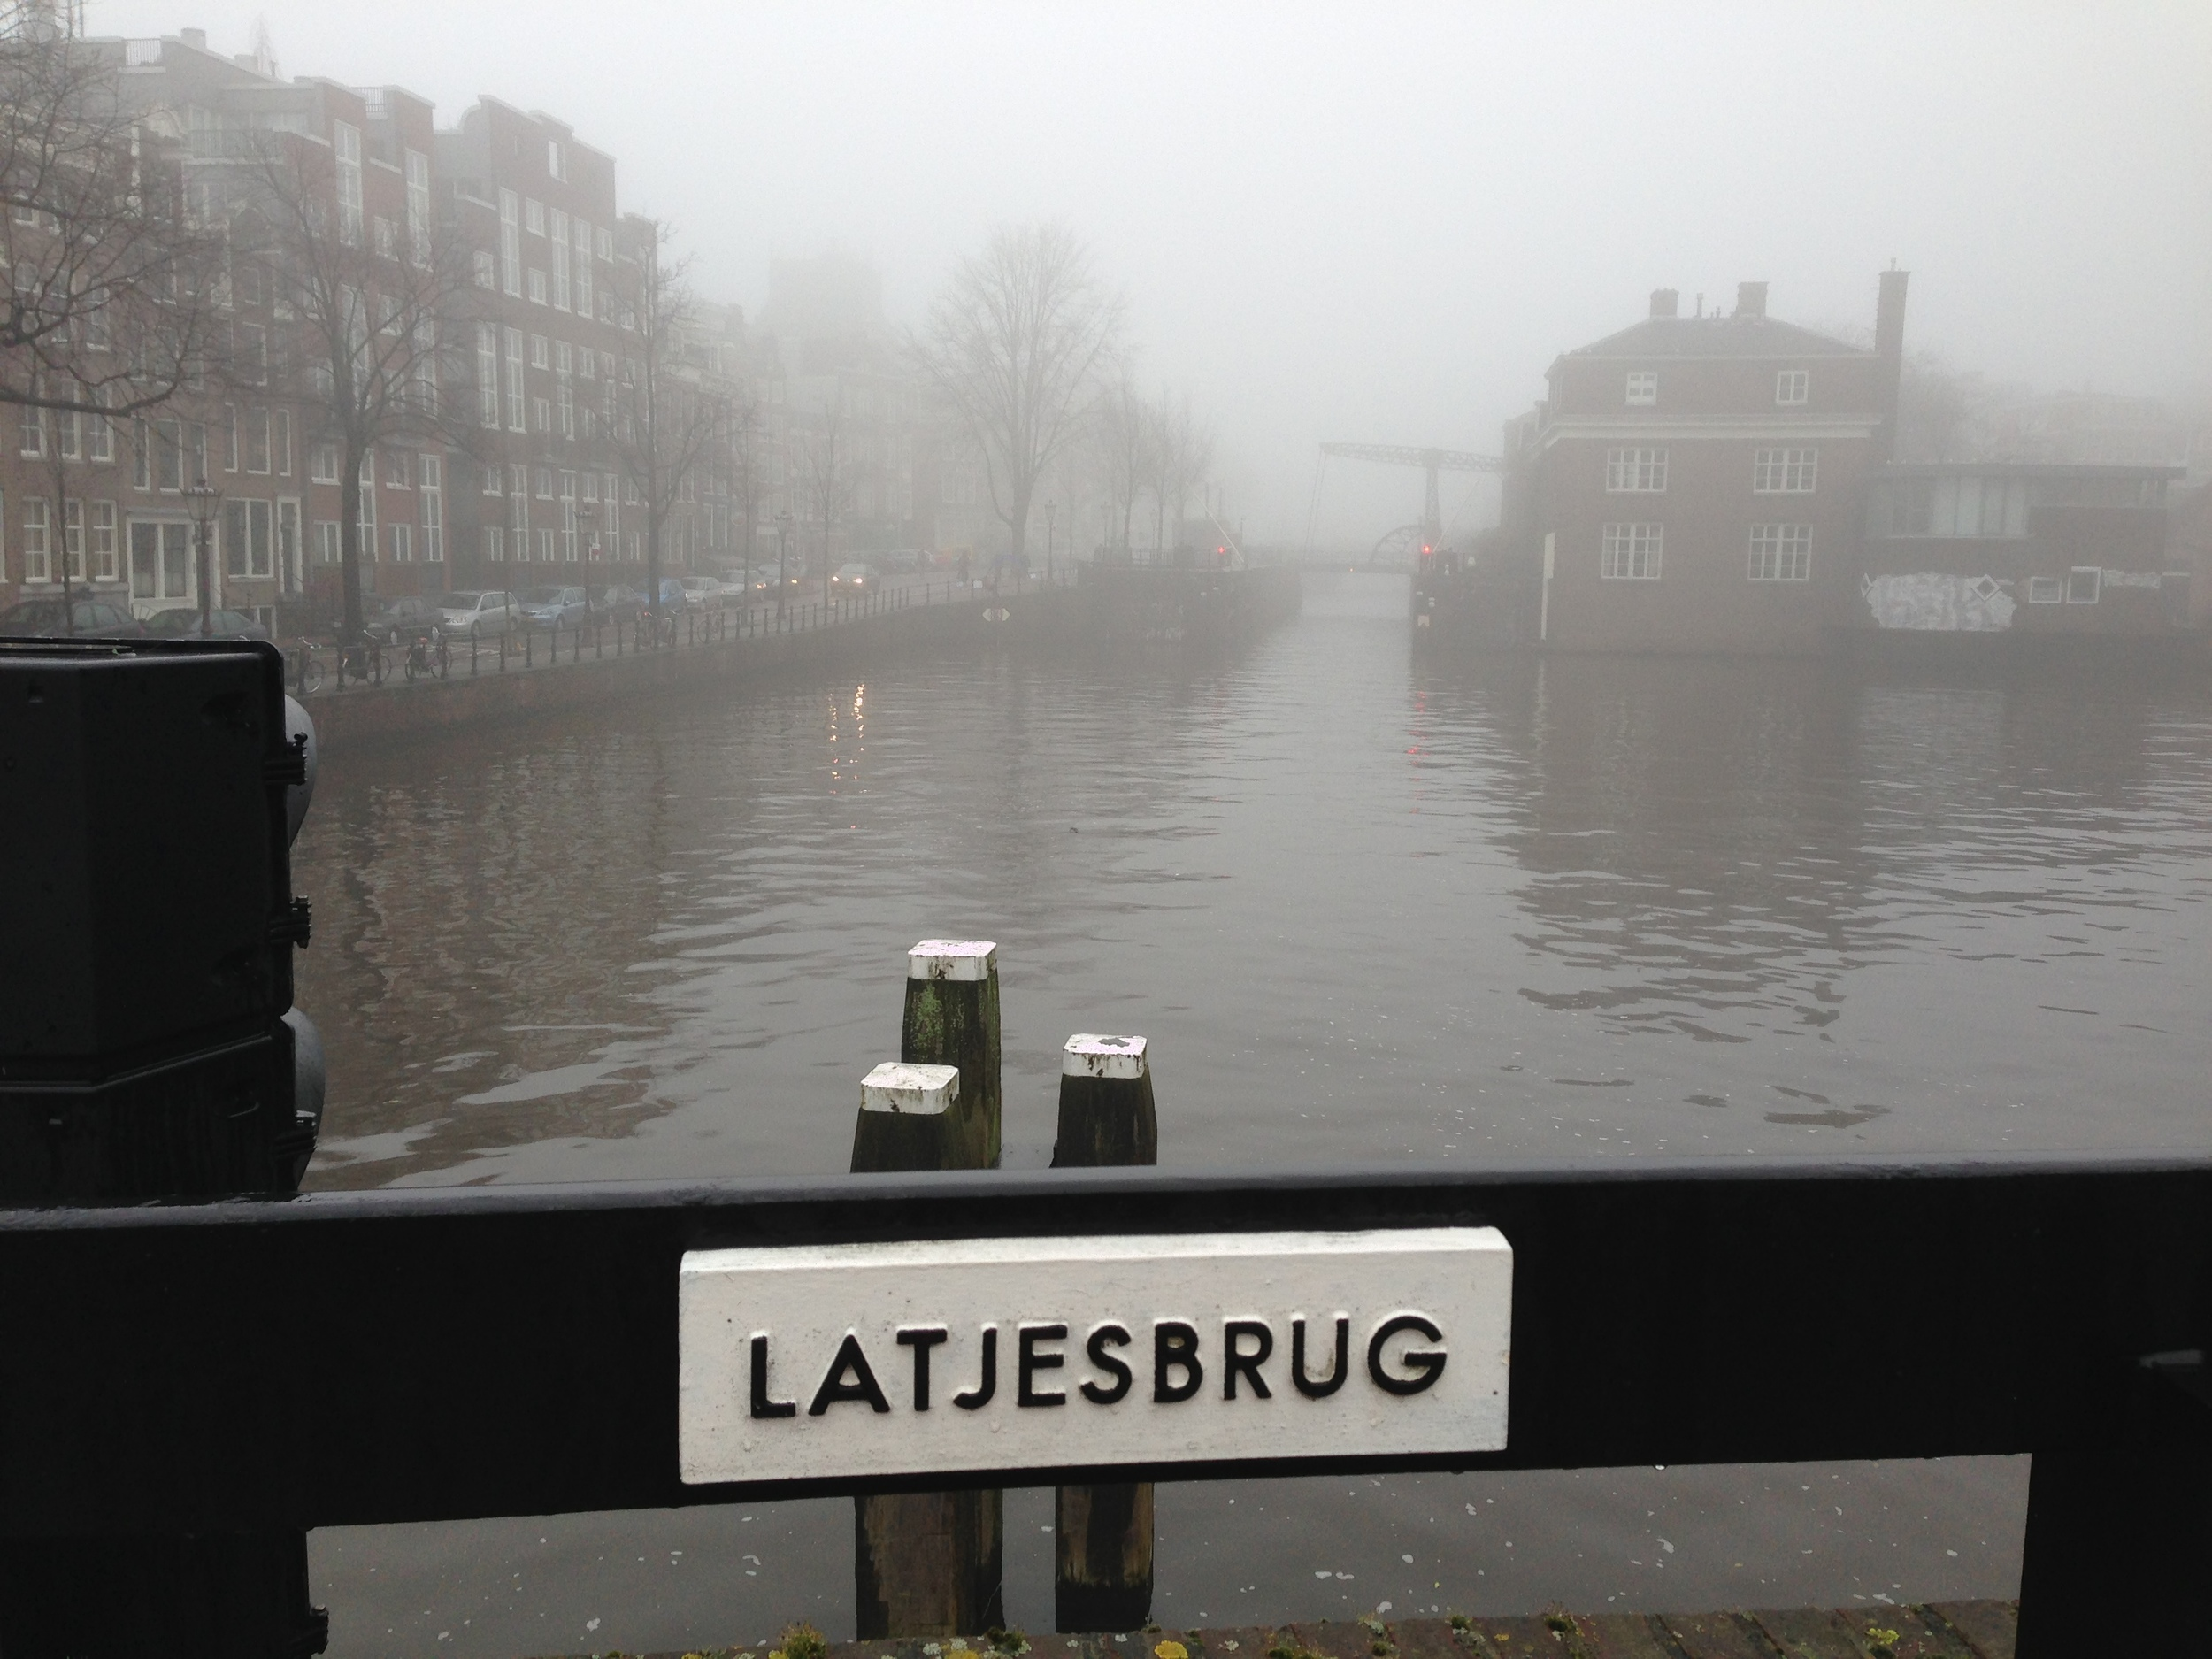 Amsterdam, Latjesbrug.